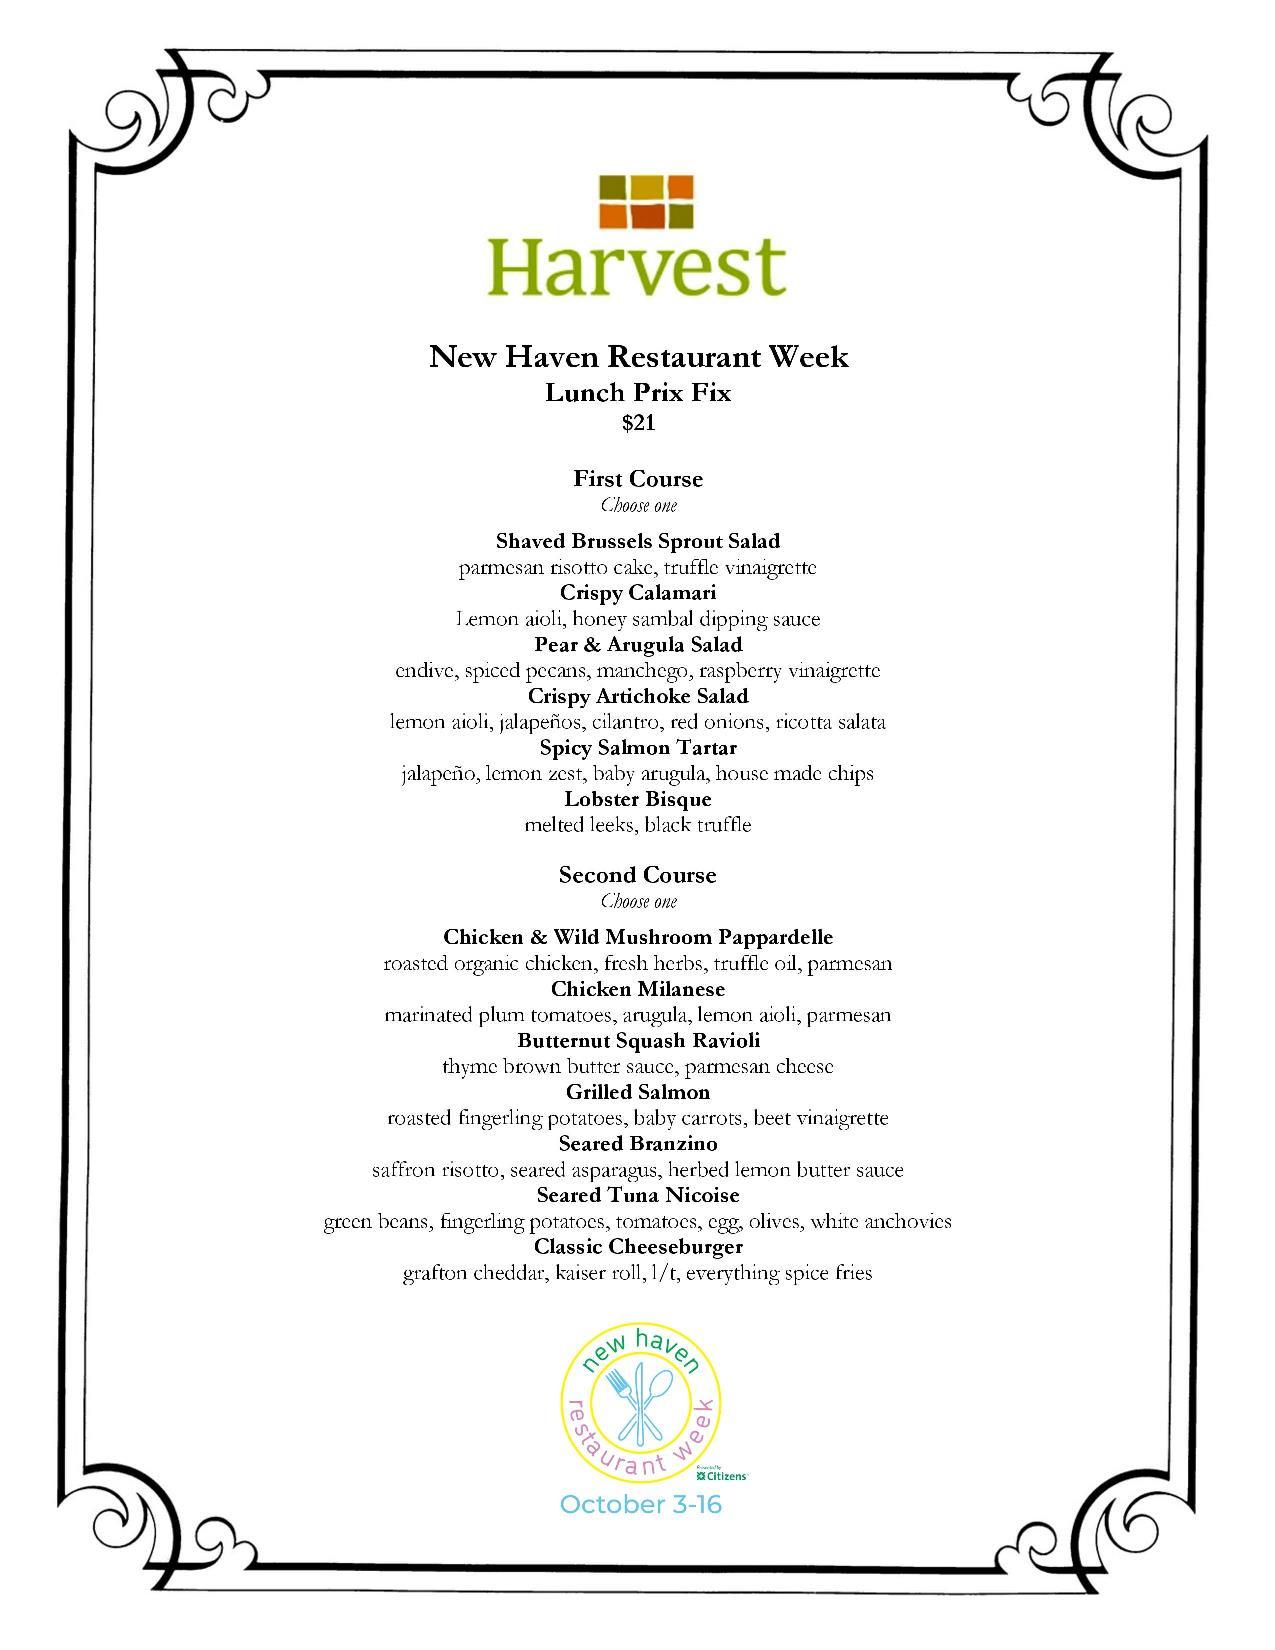 Harvest New Haven Restaurant Week 2021